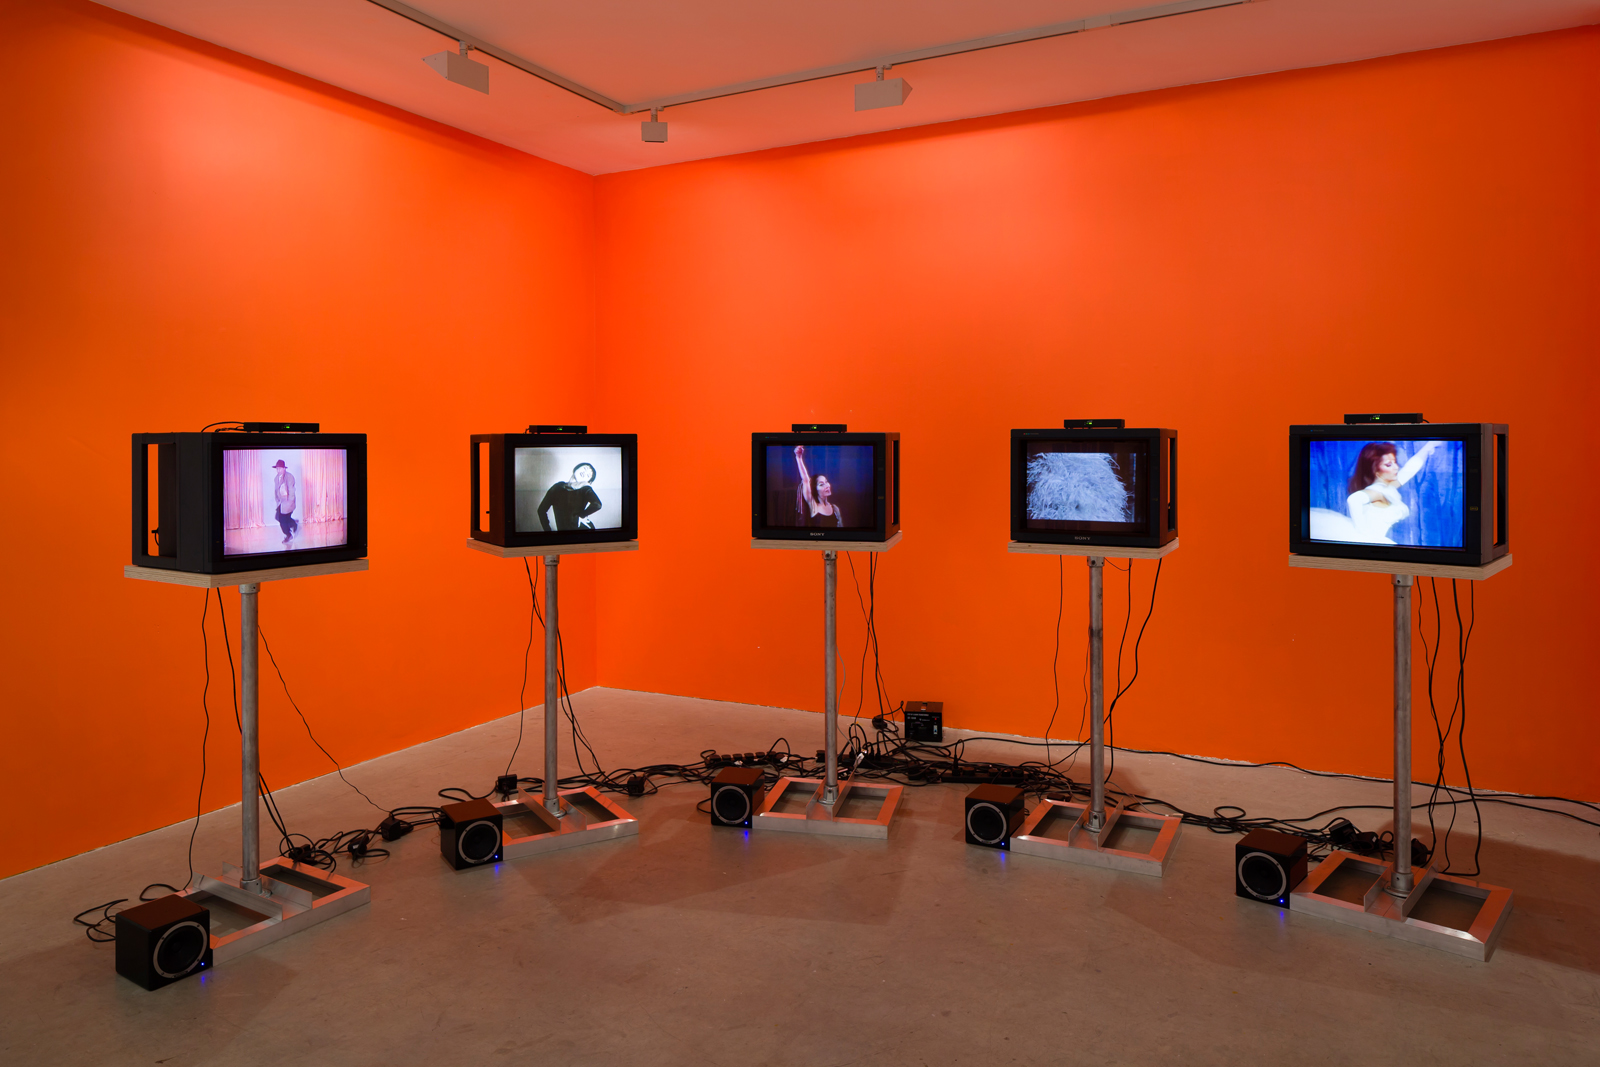 Exhibition view. Martha, Martha, Martha, Martha, Martha , Charles Atlas